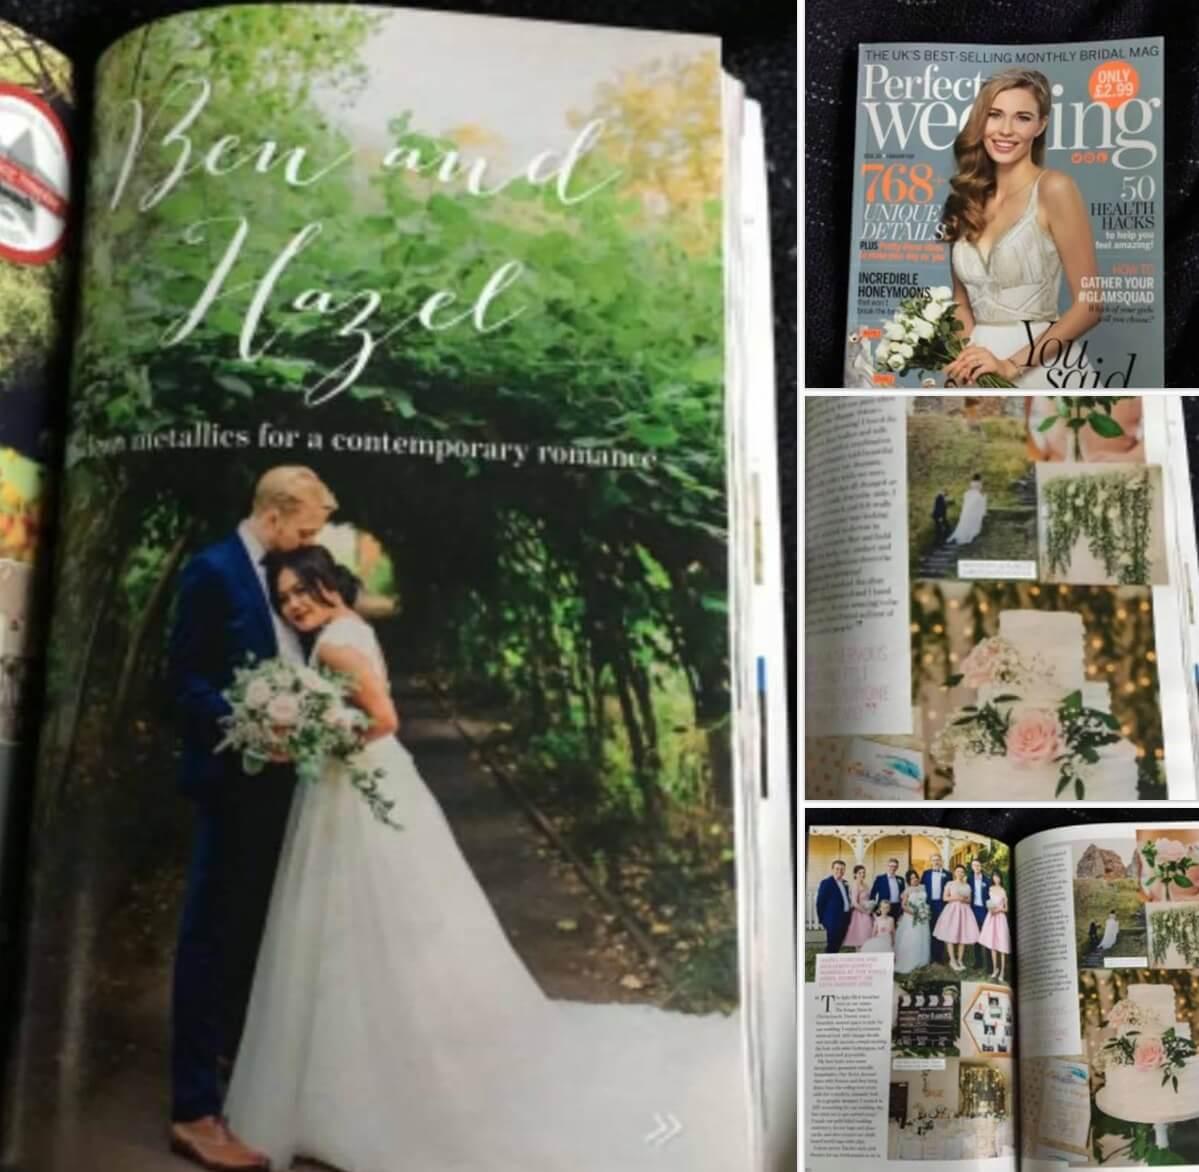 My bride & groom in Perfect Wedding magazine.